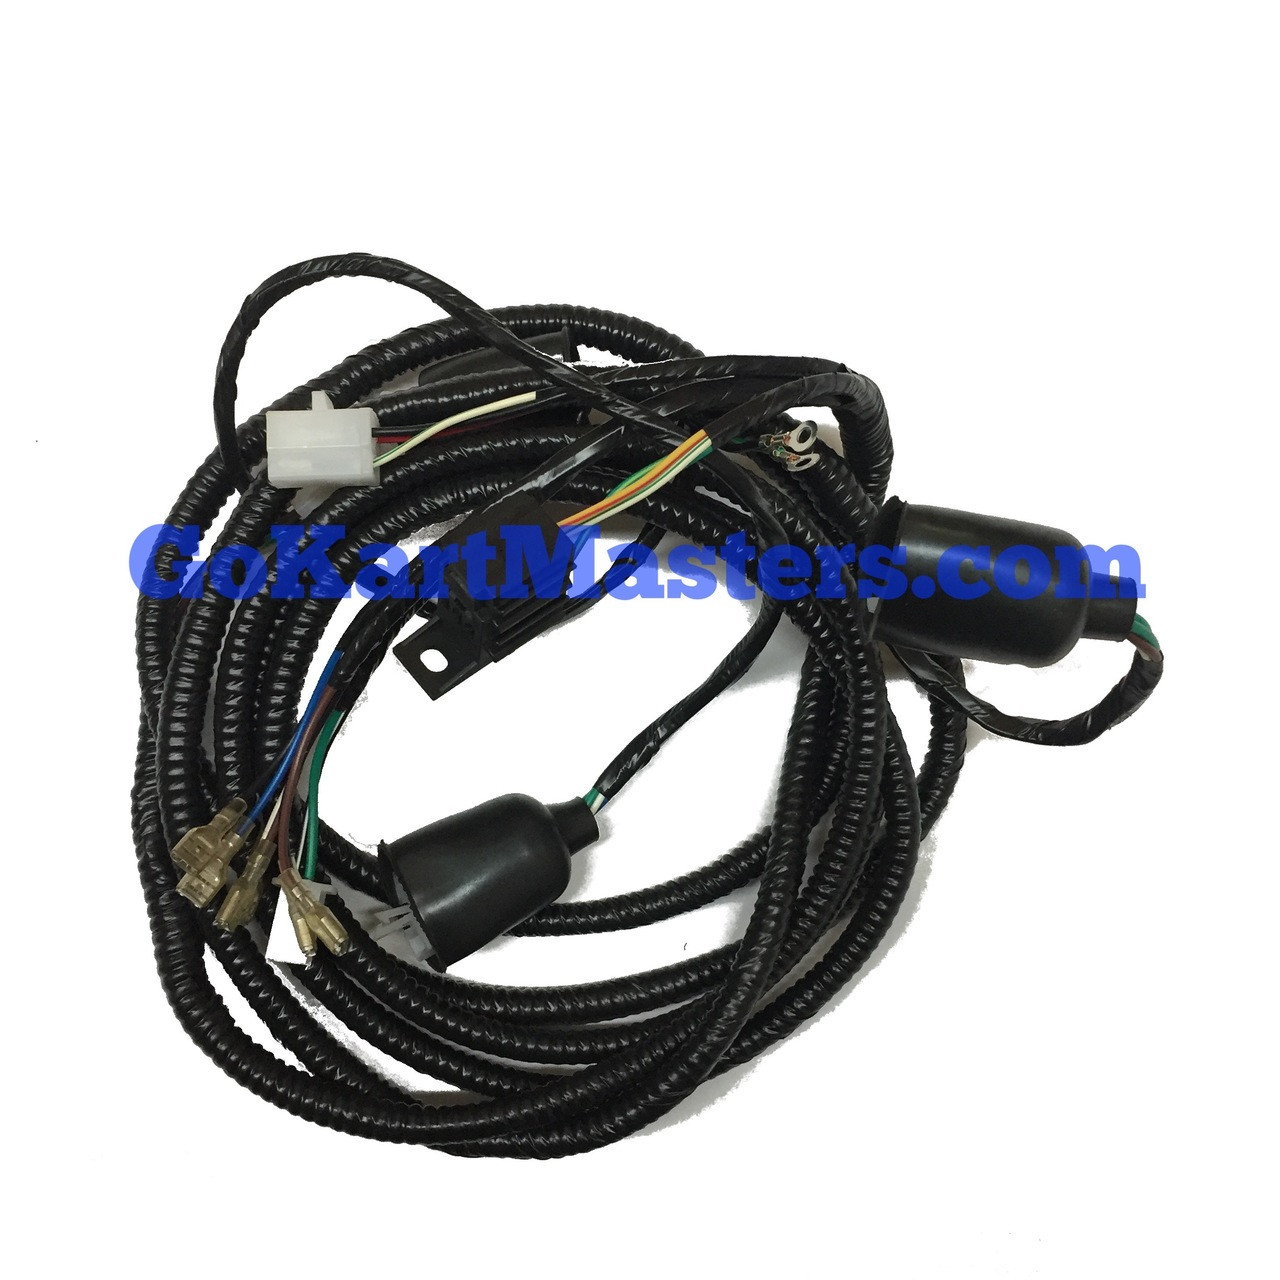 trailmaster 150 xrs main wiring harness Trailmaster 150Cc